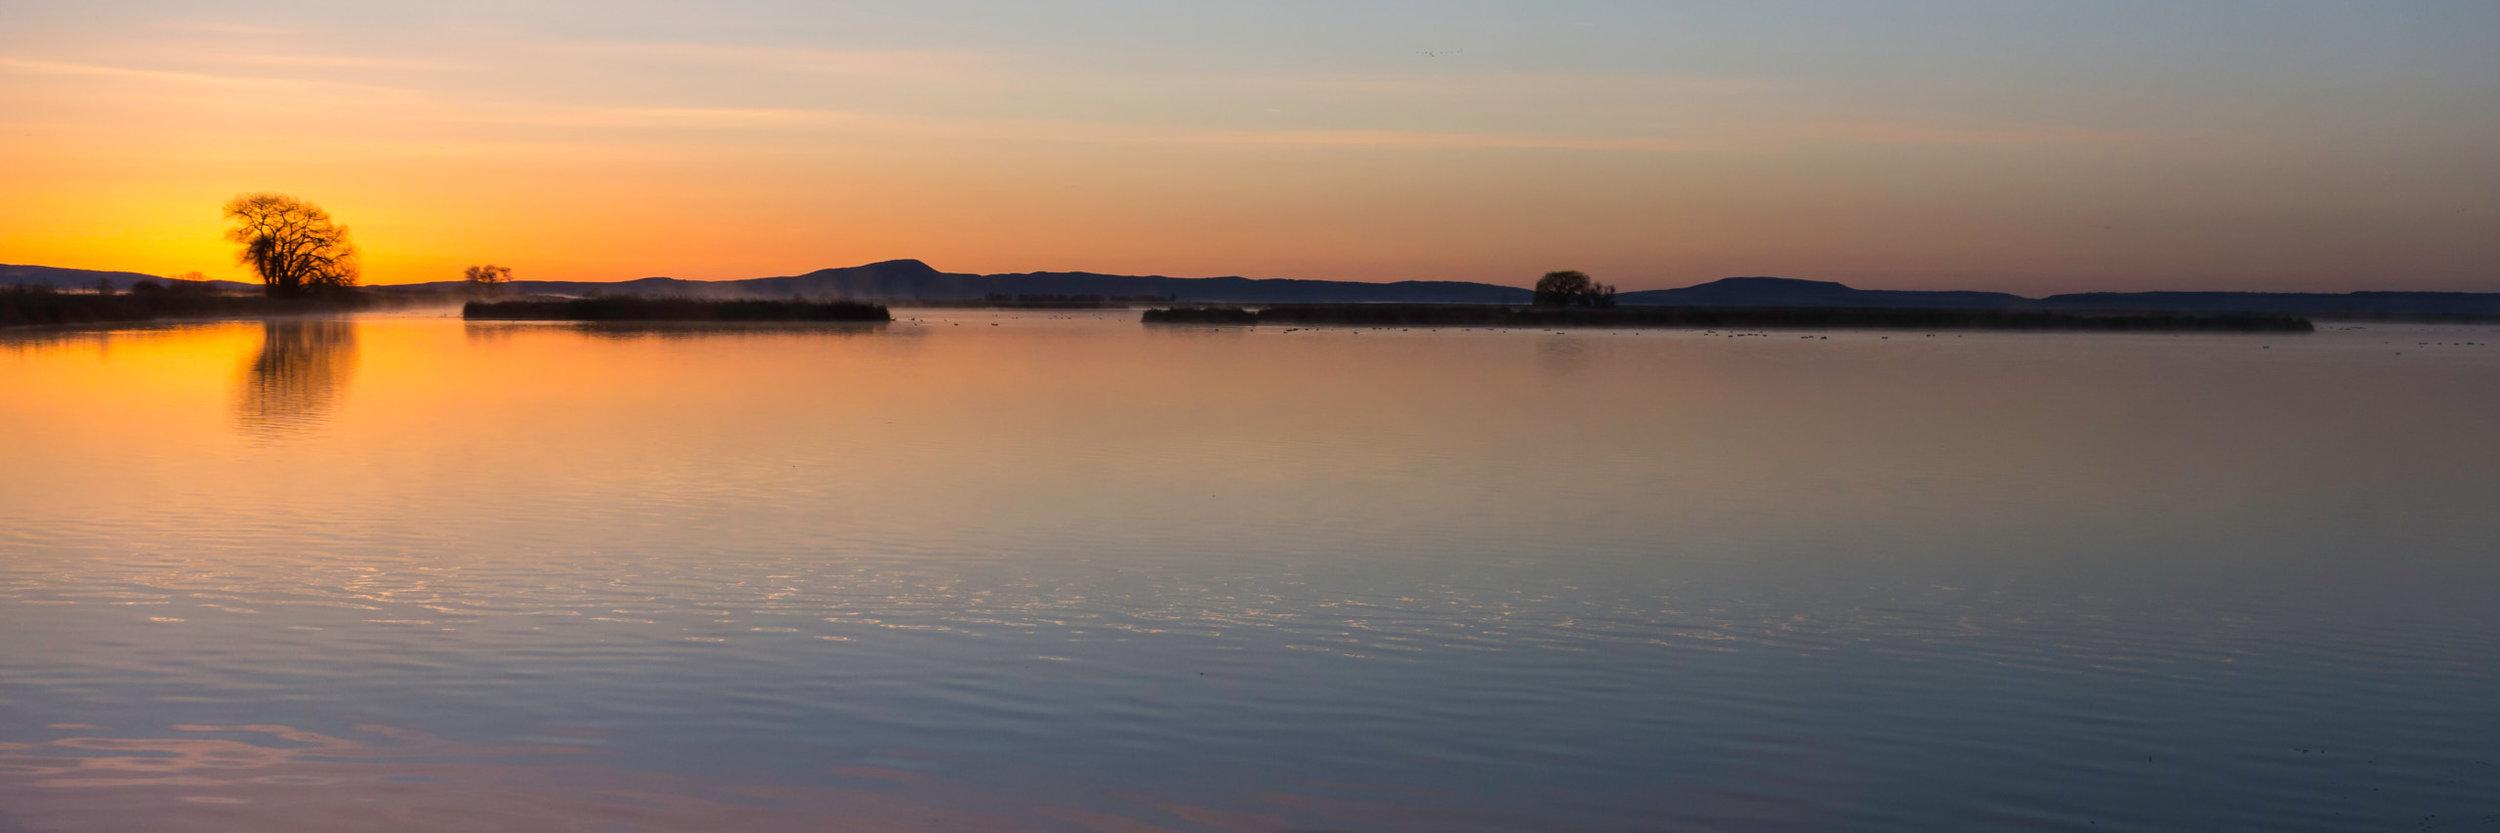 Klamath NWR Sunrise_2014 - -94-20140315_sony_0016.jpg